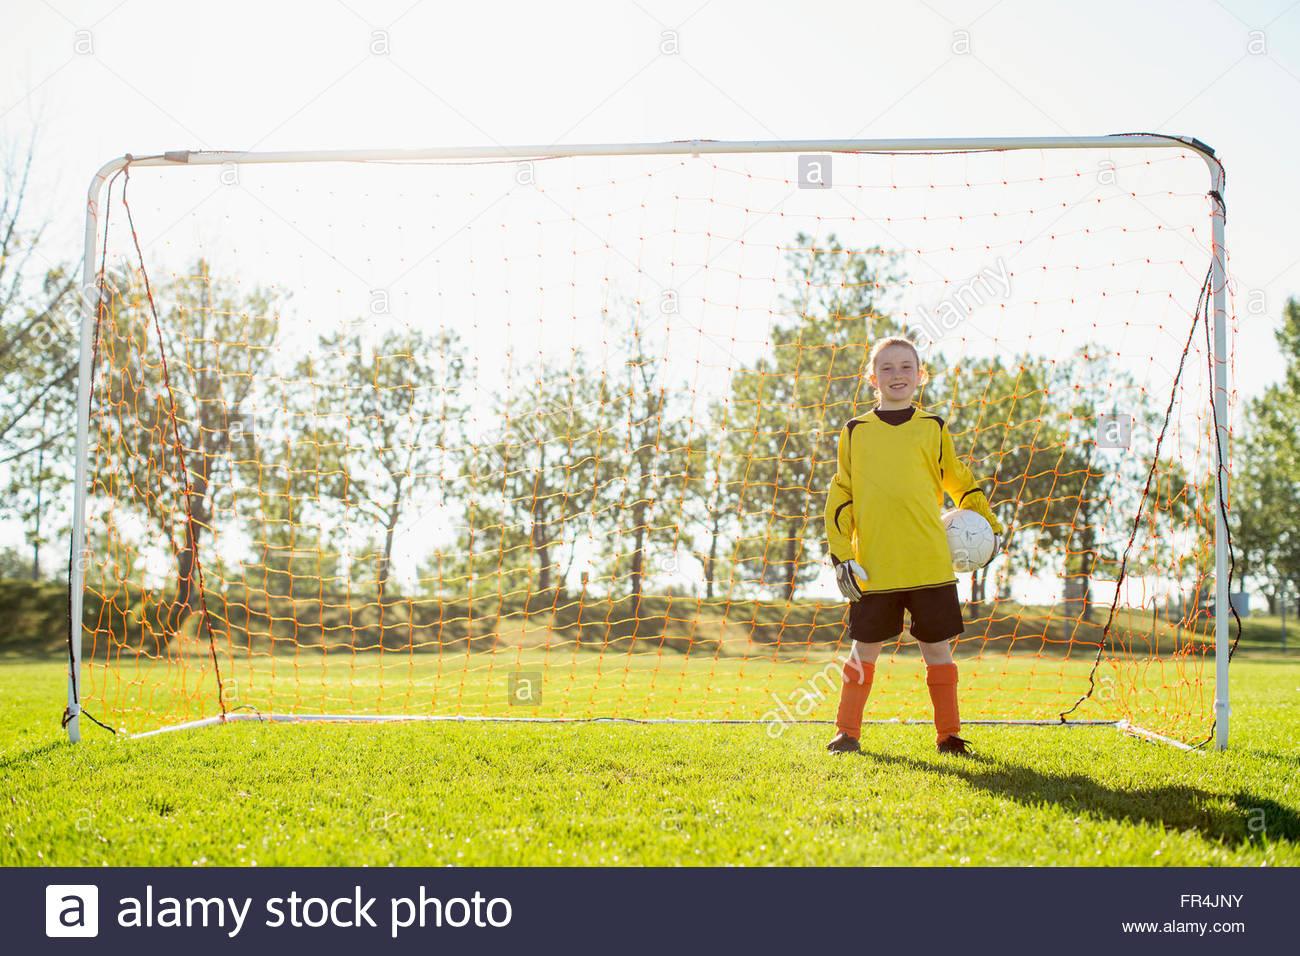 young female goalkeeper on girls soccer team - Stock Image